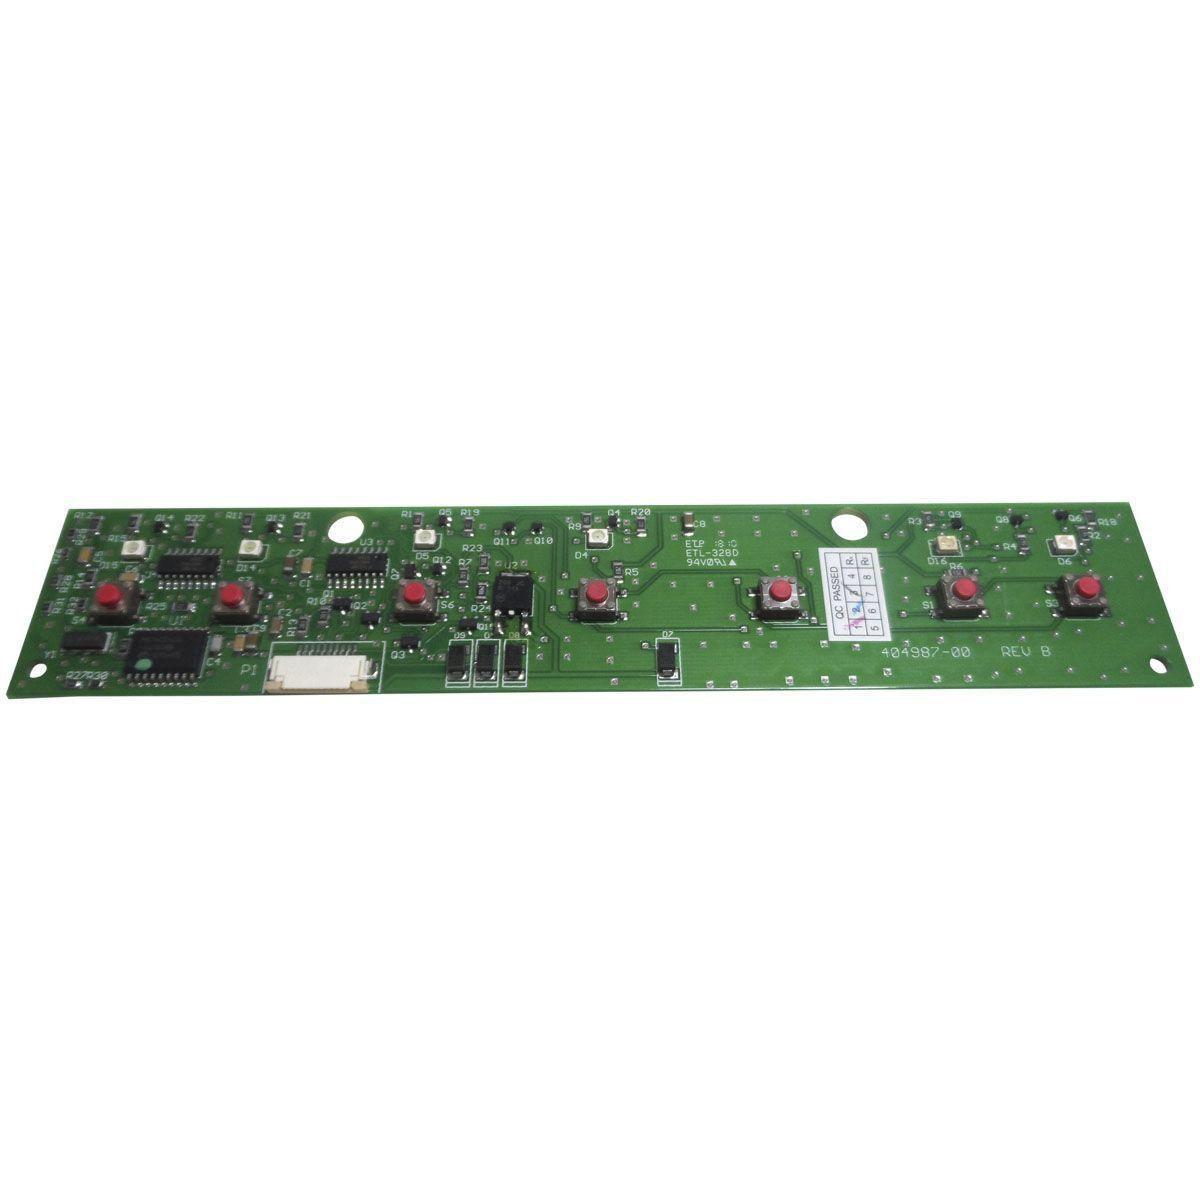 Placa Eletrônica Refrigerador Side By Side Electrolux 41708307